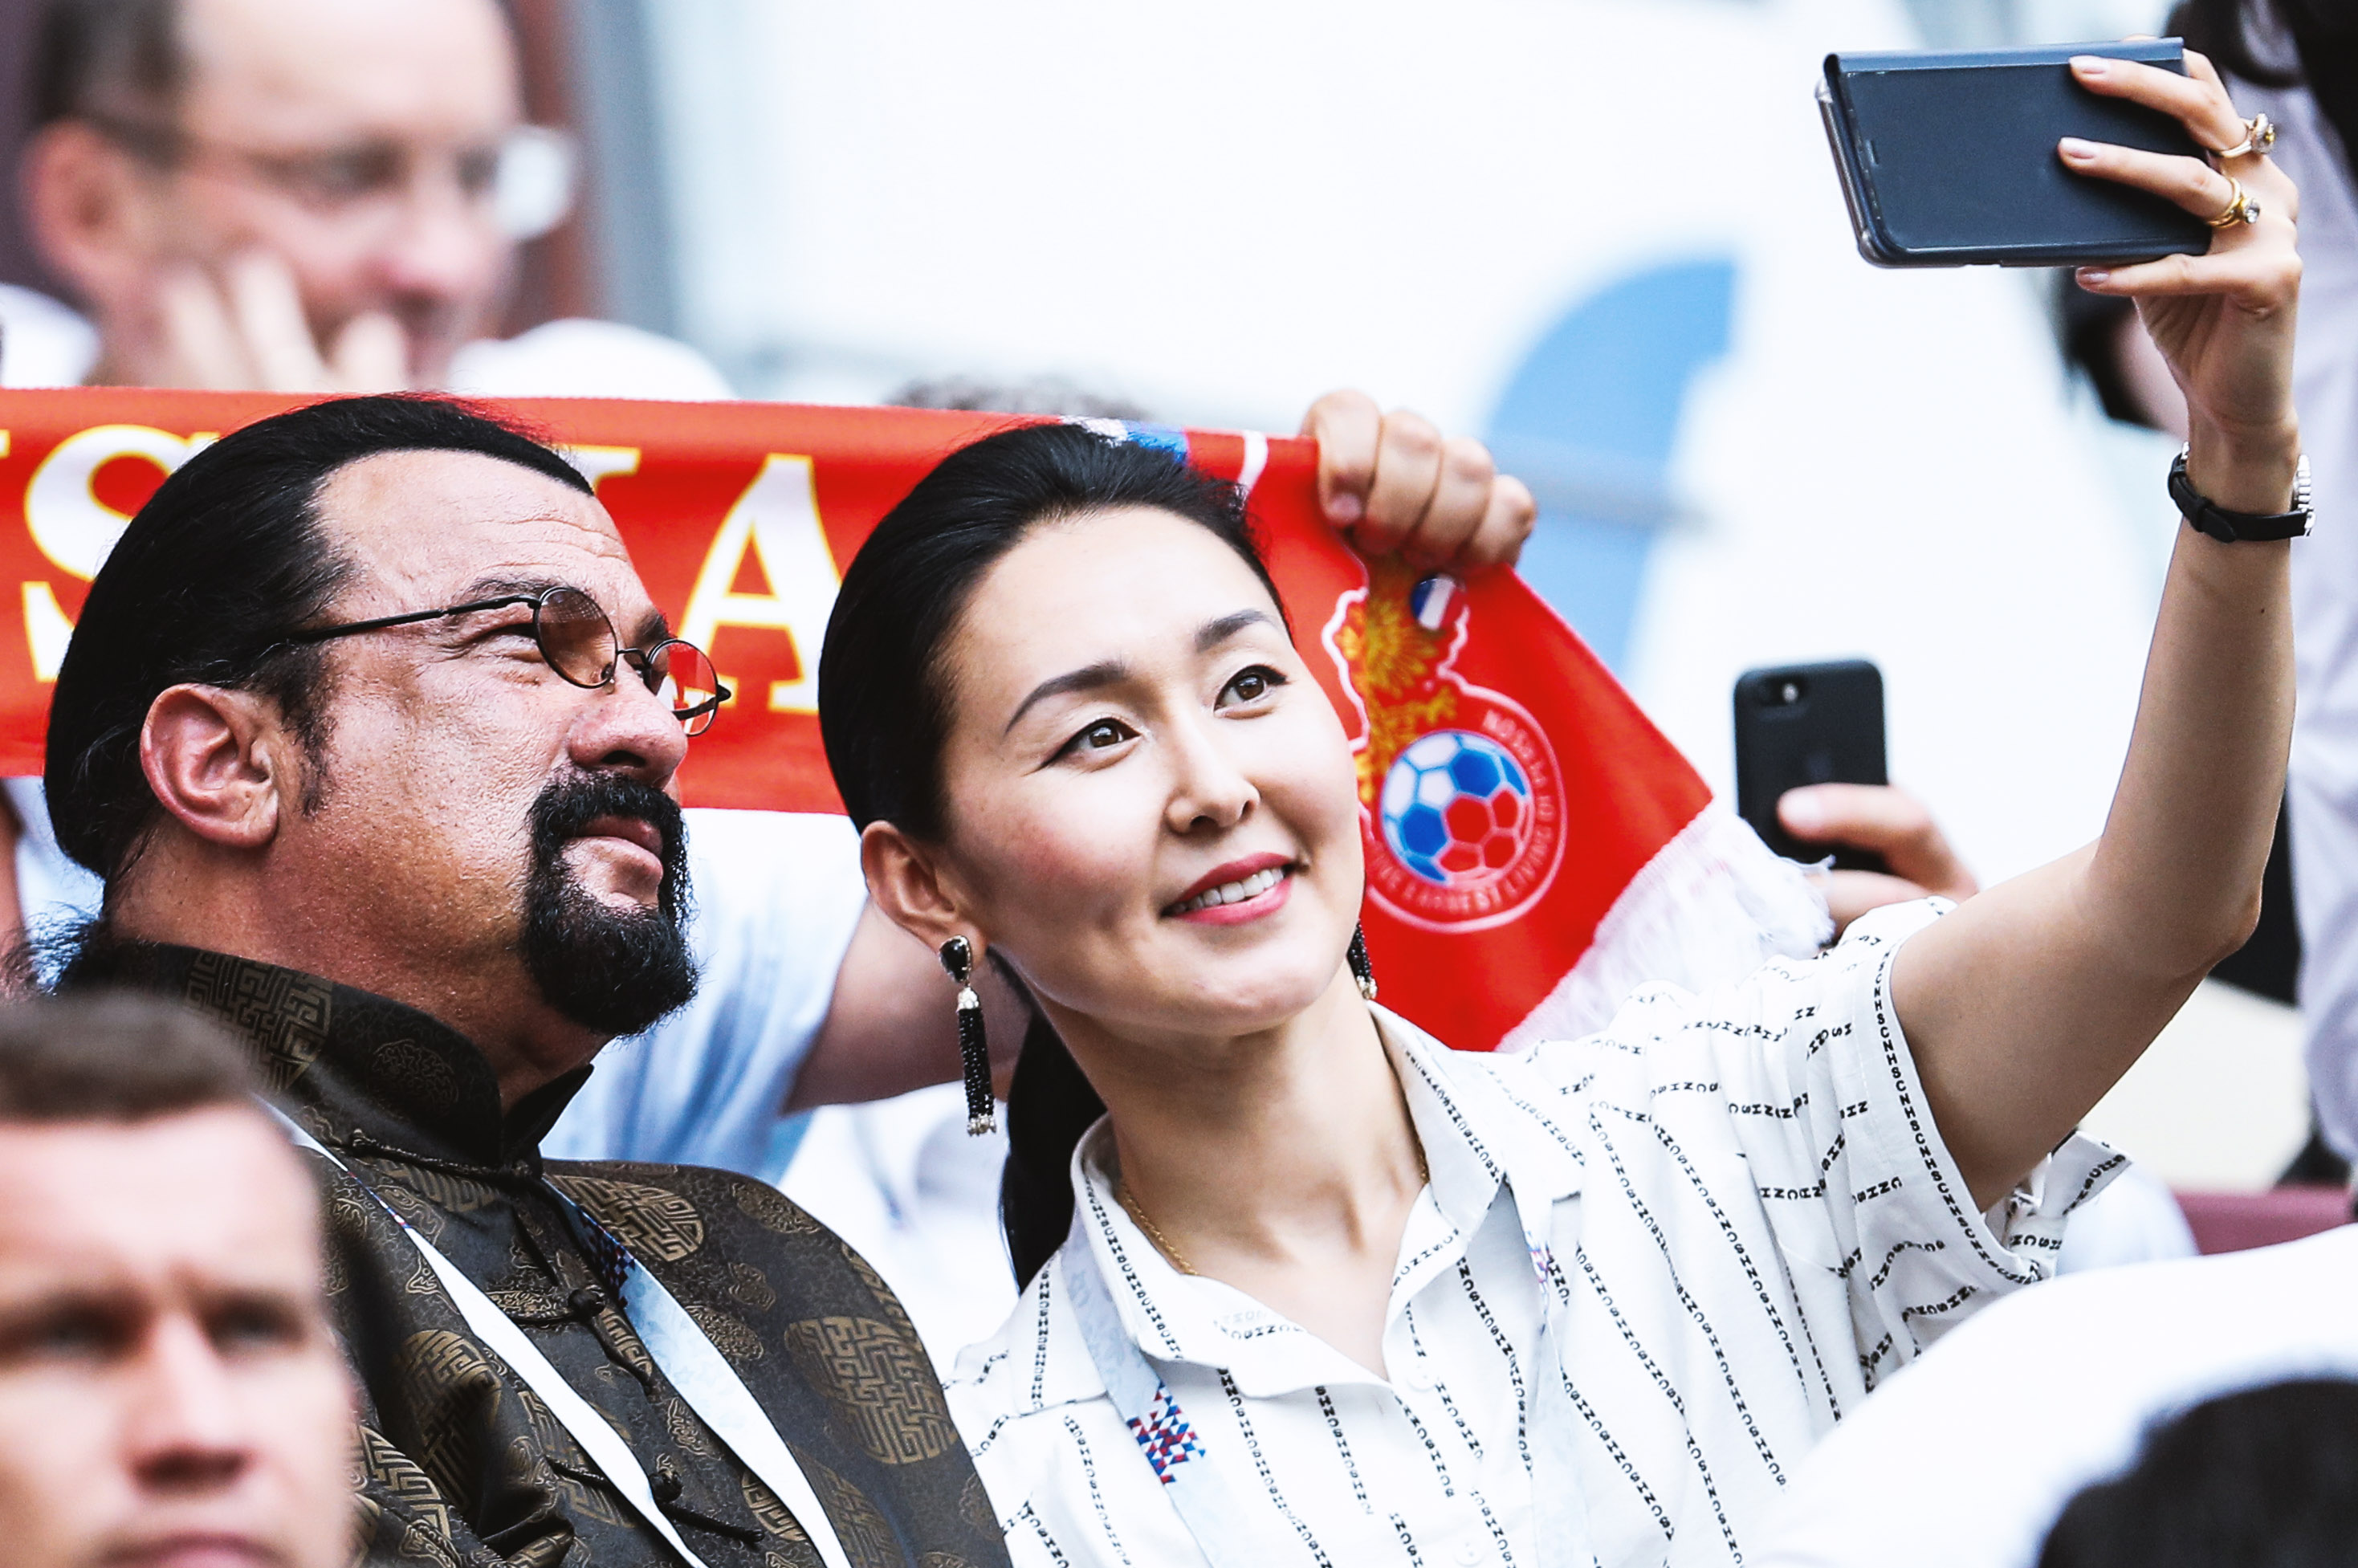 Актер Стивен Сигал иего супруга Эрденетуя Батсух